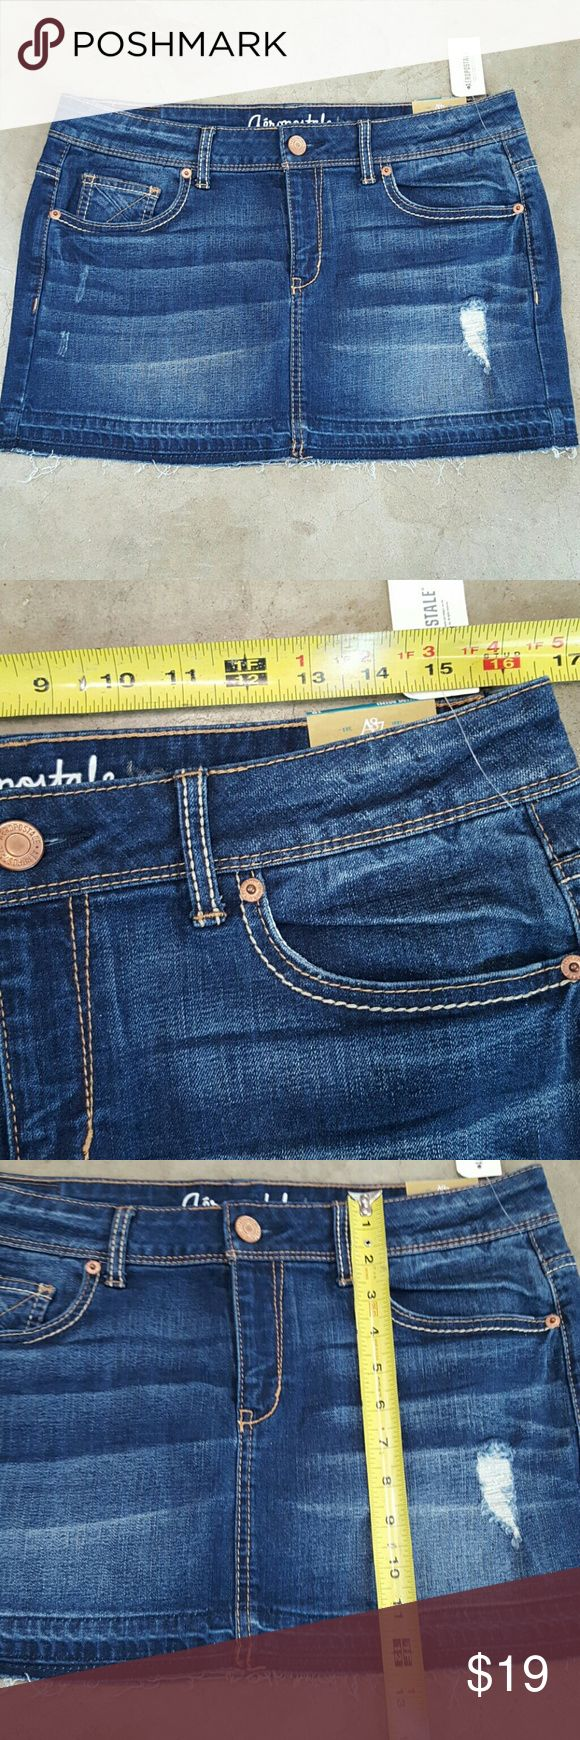 Aeropostale jean skirt size 10 NWOT 99% cotton 1% spandex Aeropostale Skirts Mini